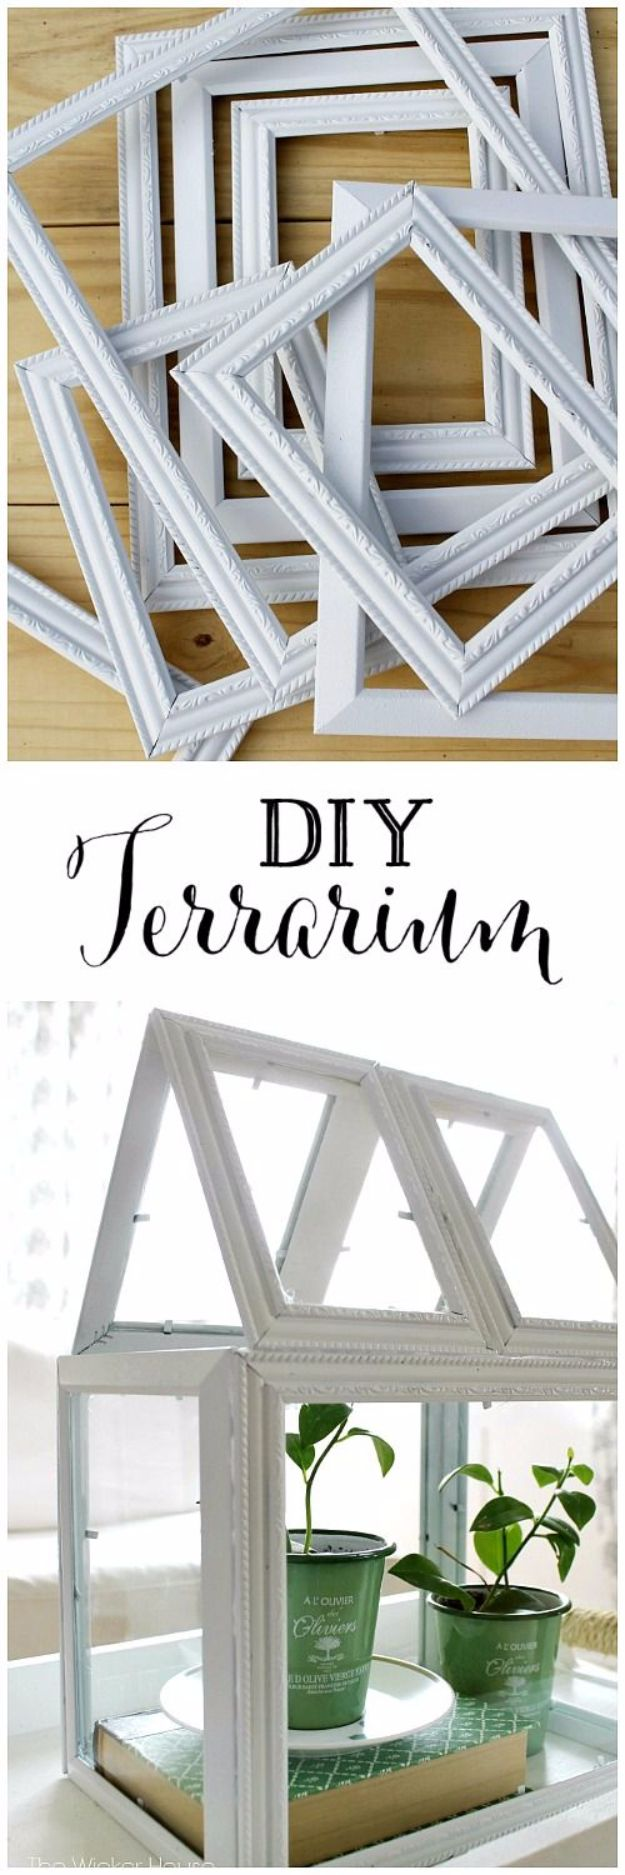 DIY Terrarium Ideas - Picture Frame Greenhouse Terrarium - Cool Terrariums and Crafts With Mason Jars, Succulents, Wood, Geometric Designs and Reptile, Acquarium - Easy DIY Terrariums for Adults and Kids To Make at Home http://diyjoy.com/diy-terrarium-ideas